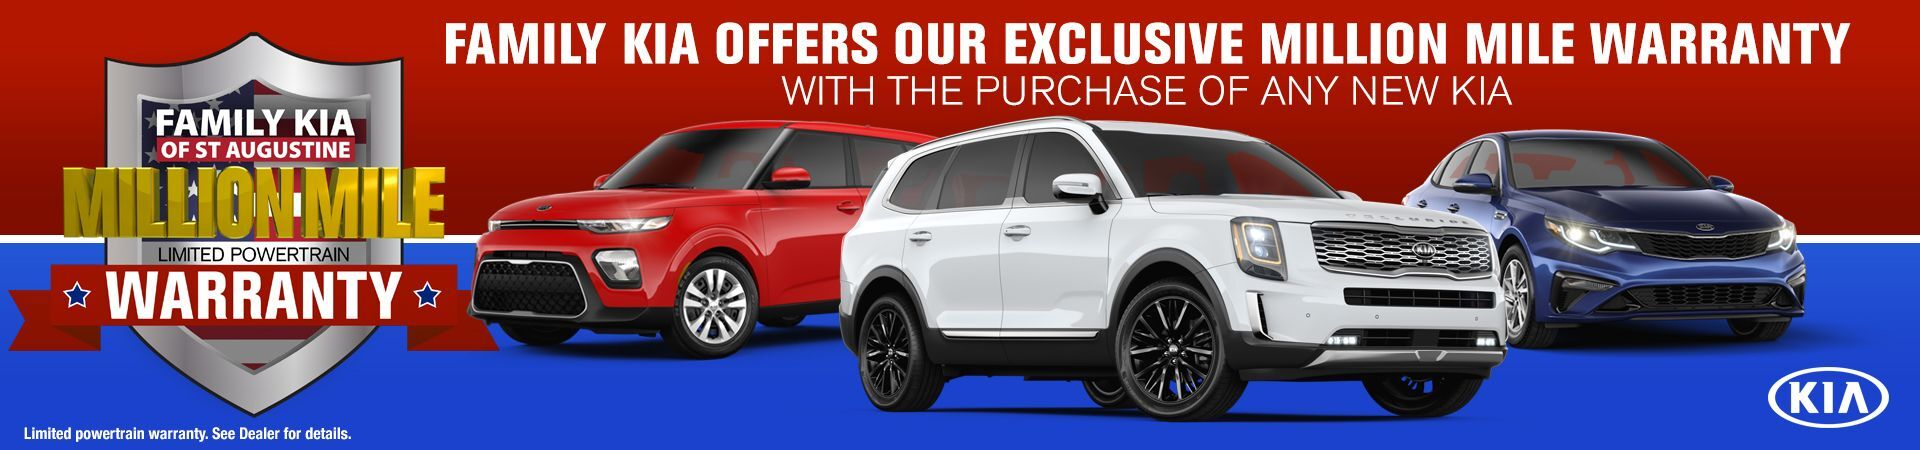 Million Mile Limited Powertrain Warranty promotional image with Kia Telluride